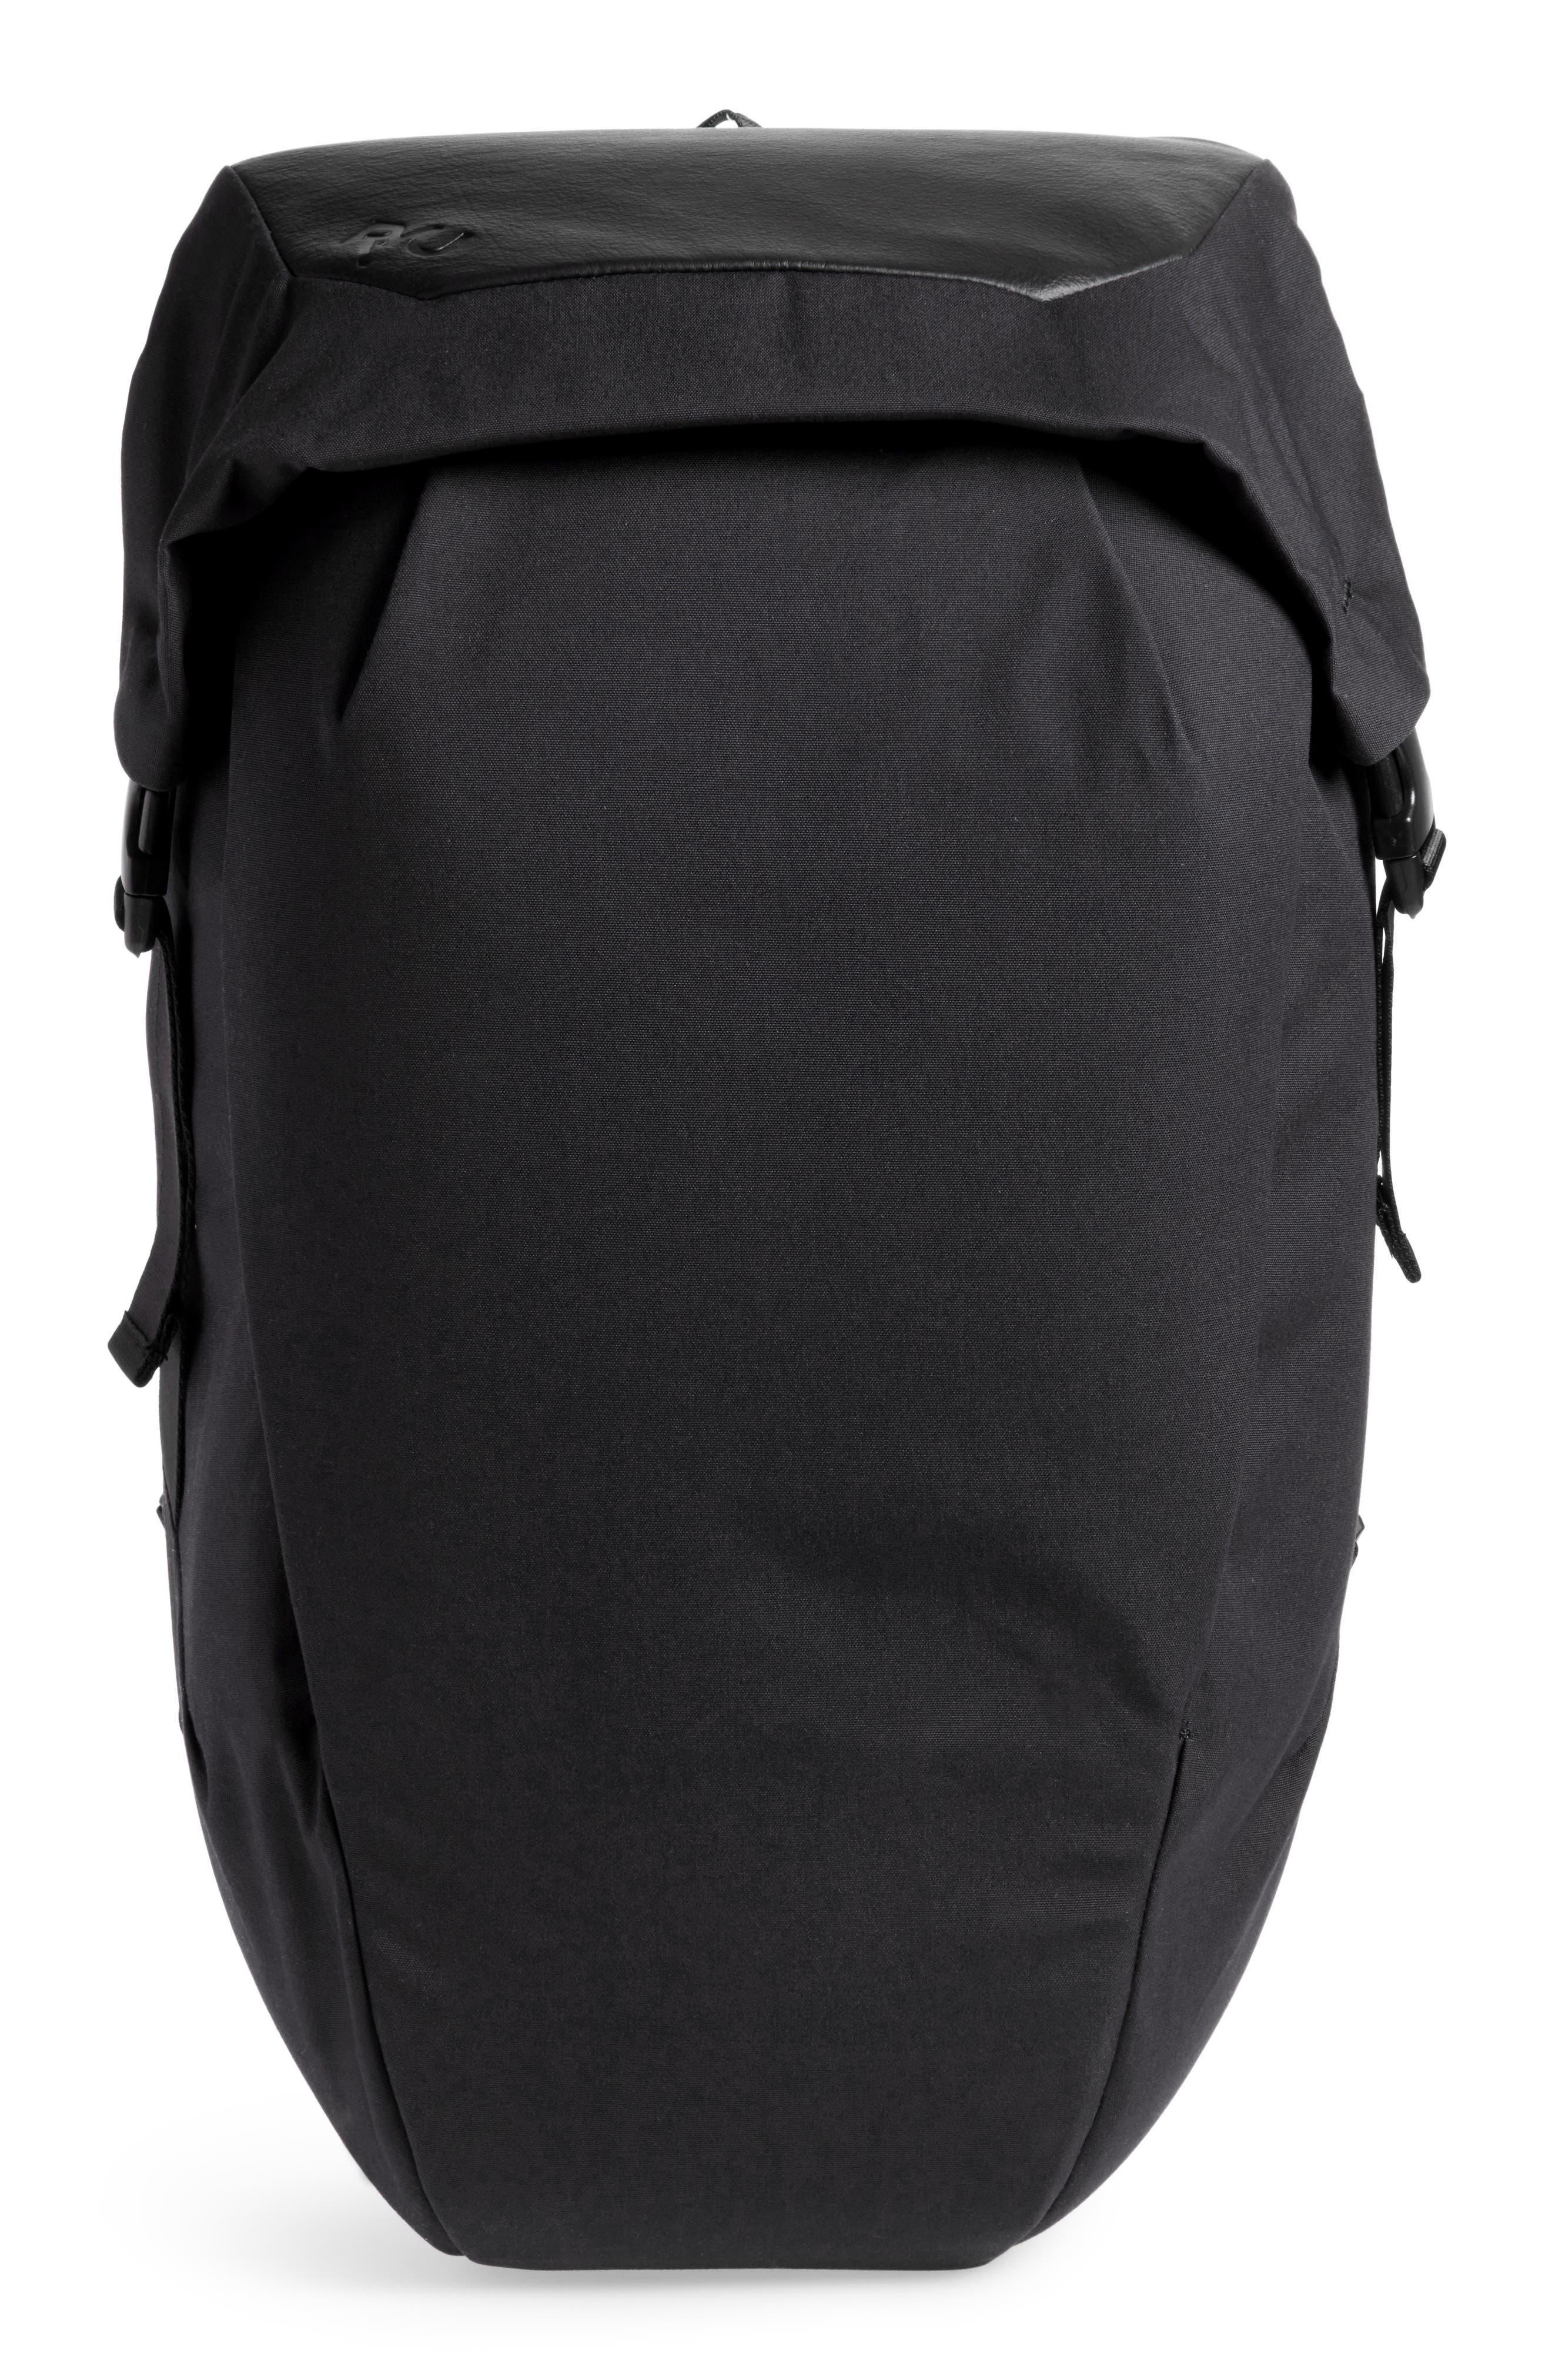 Locker Pack Lux Backpack,                         Main,                         color, 001